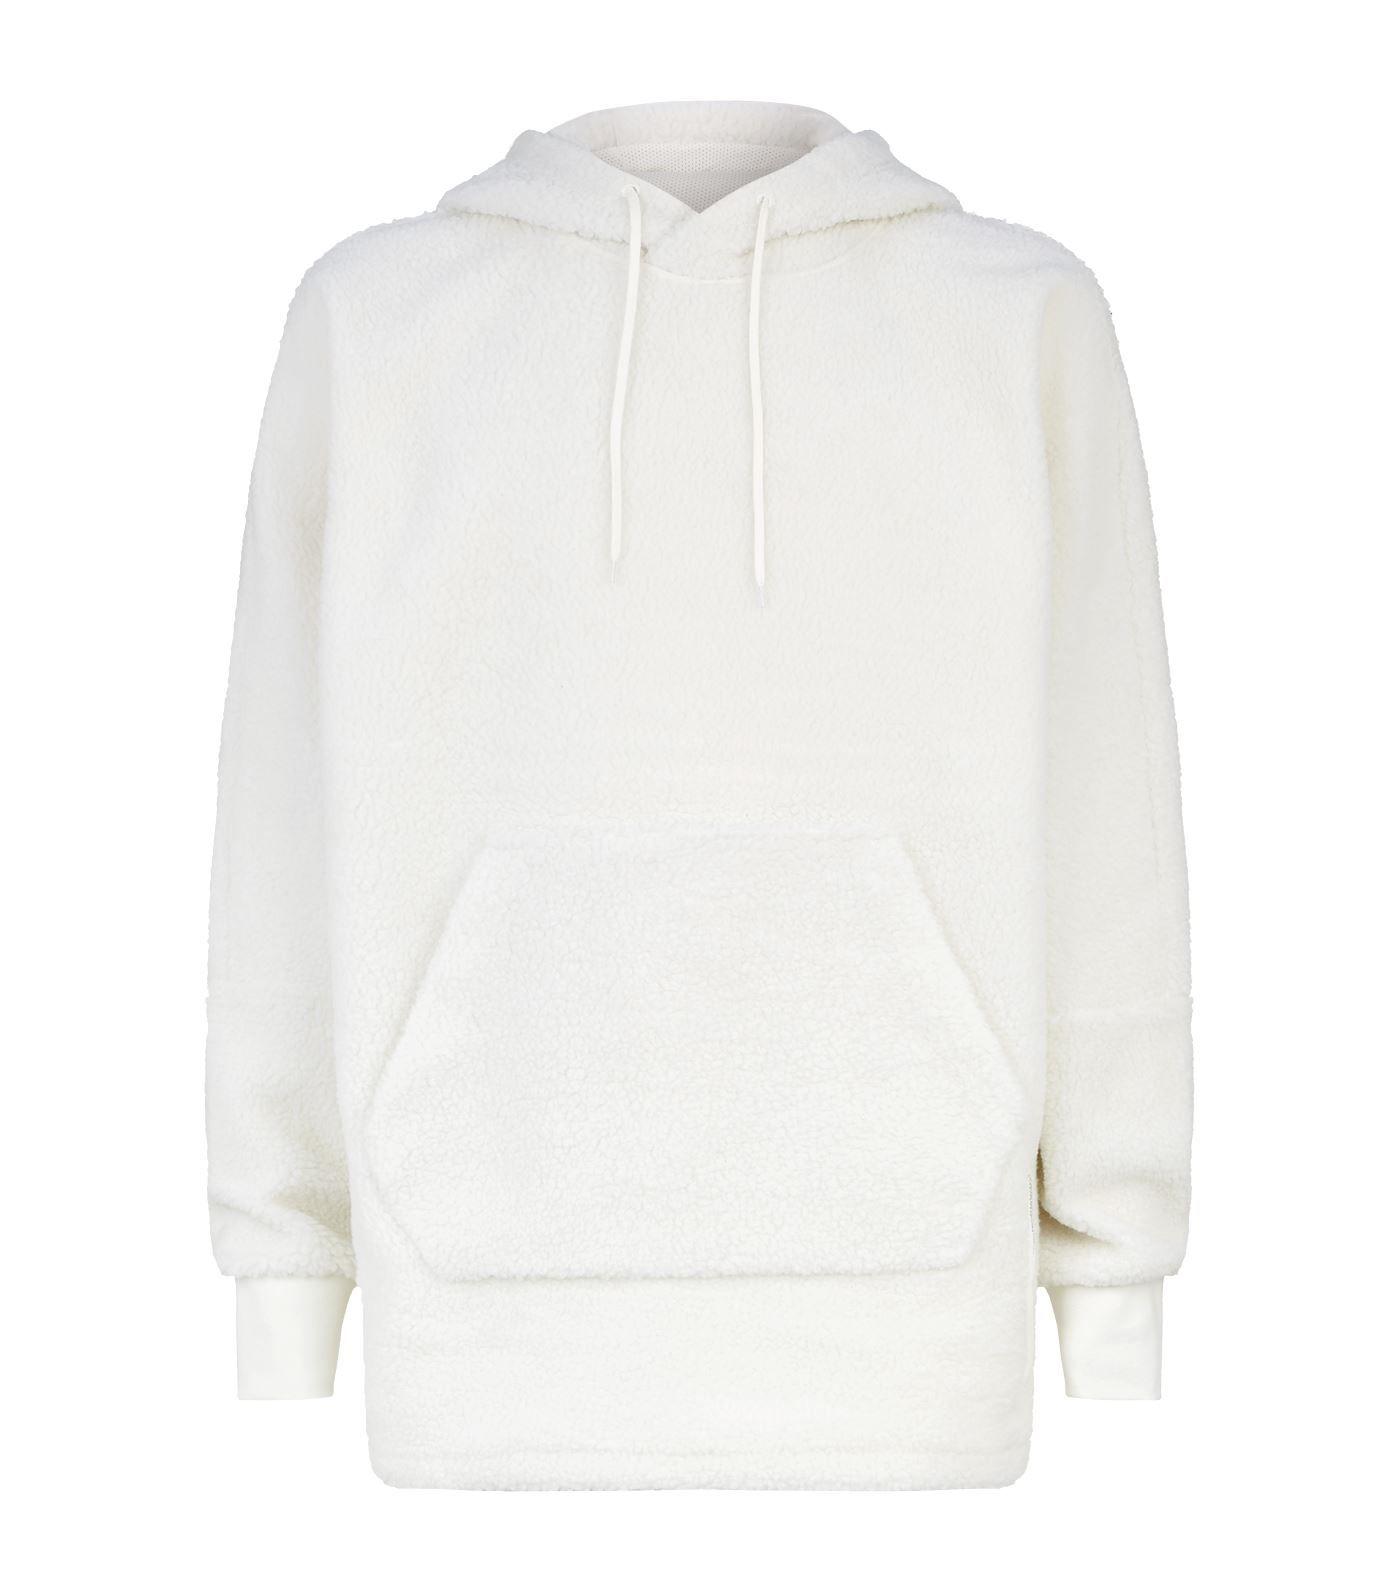 adidas nmd hoodie